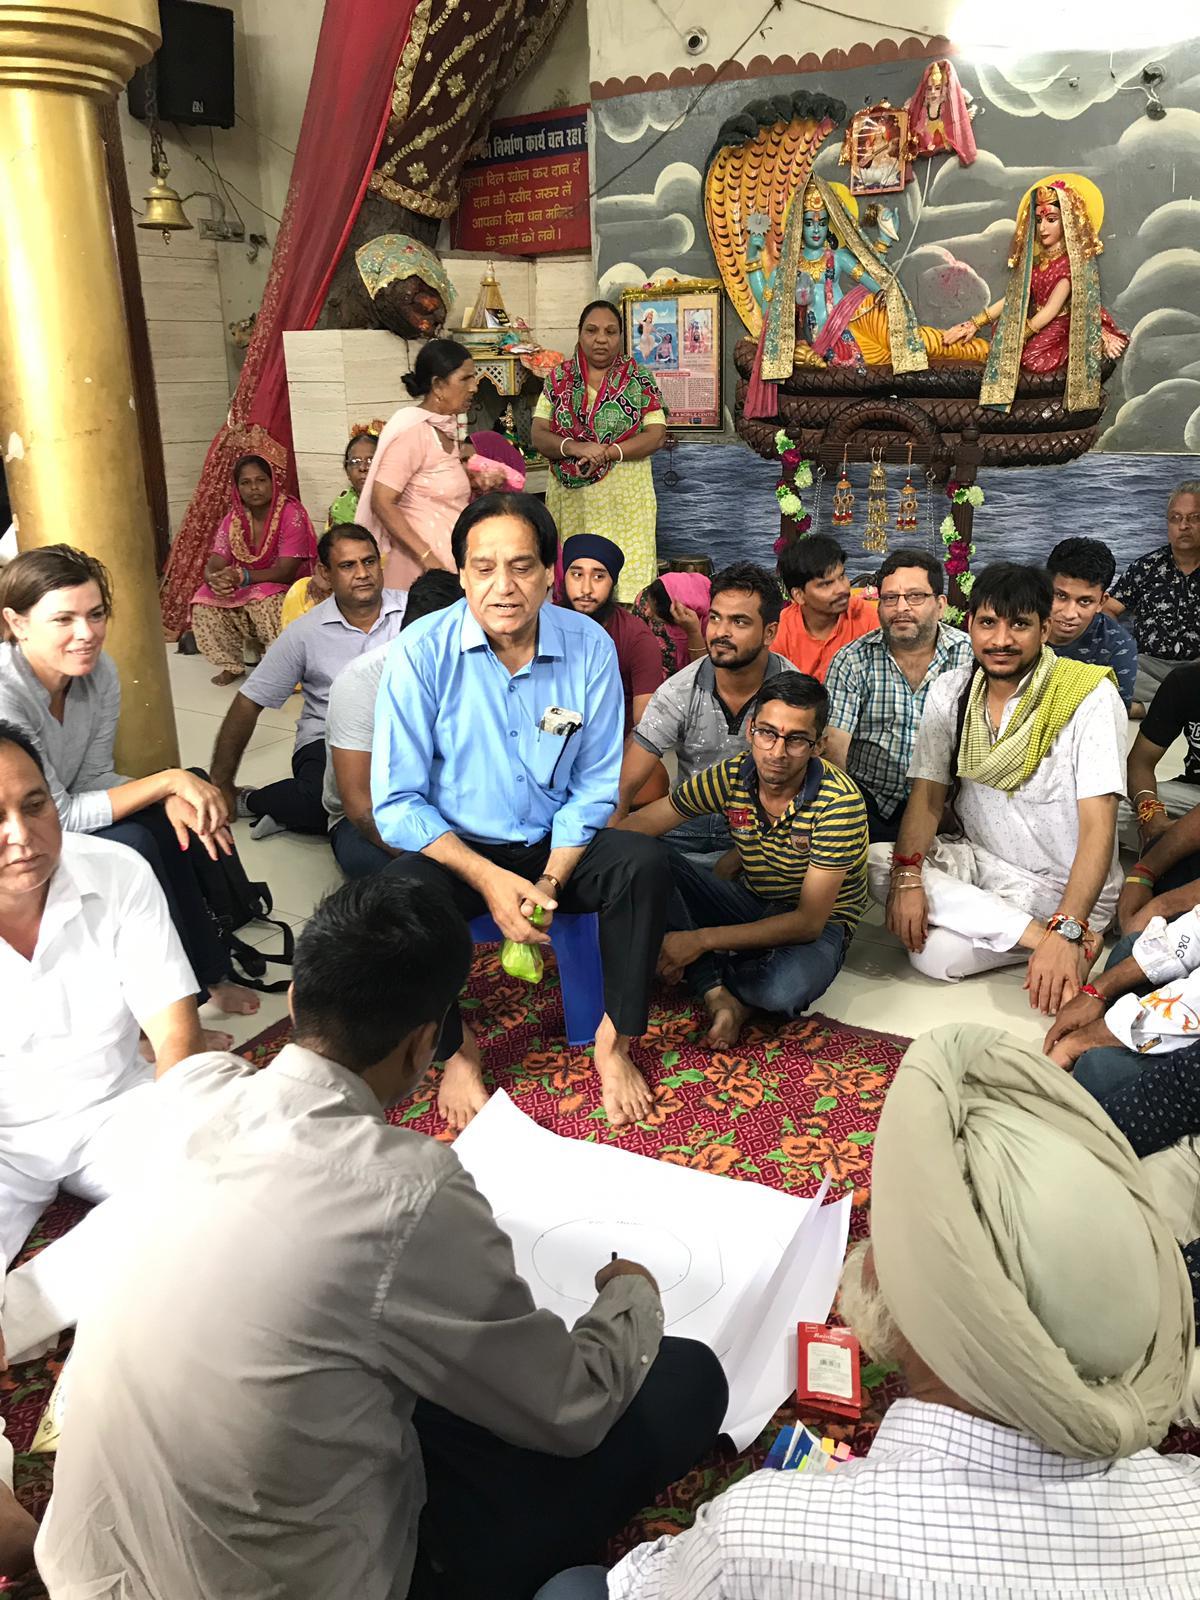 Vendors mapping the assets at Sudama market adjoining Jyoti Chowk.